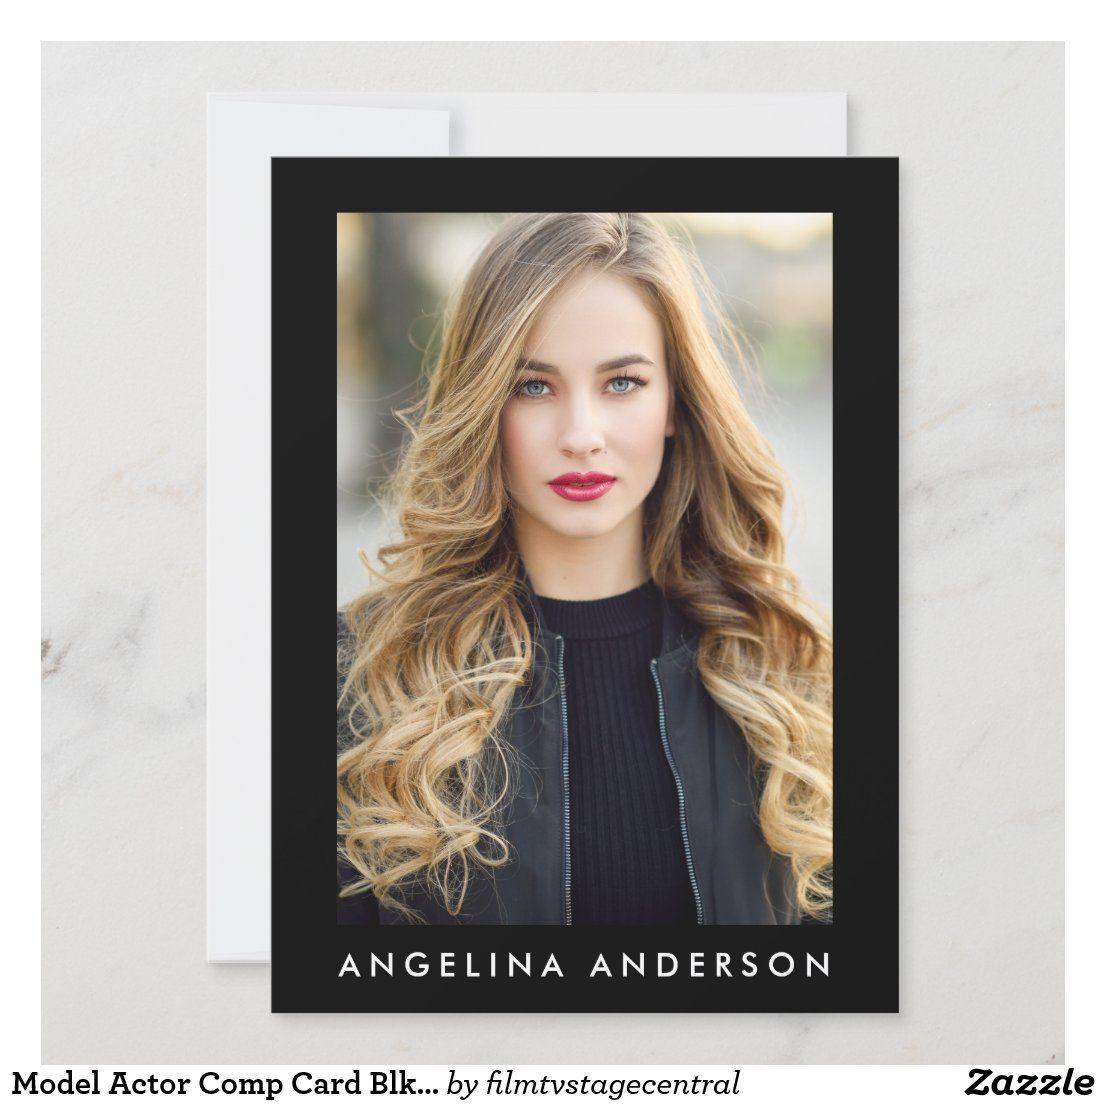 Model Actor Comp Card Blk 4 Photo Back Zazzle Com In 2020 Actor Photo Model Comp Card Model